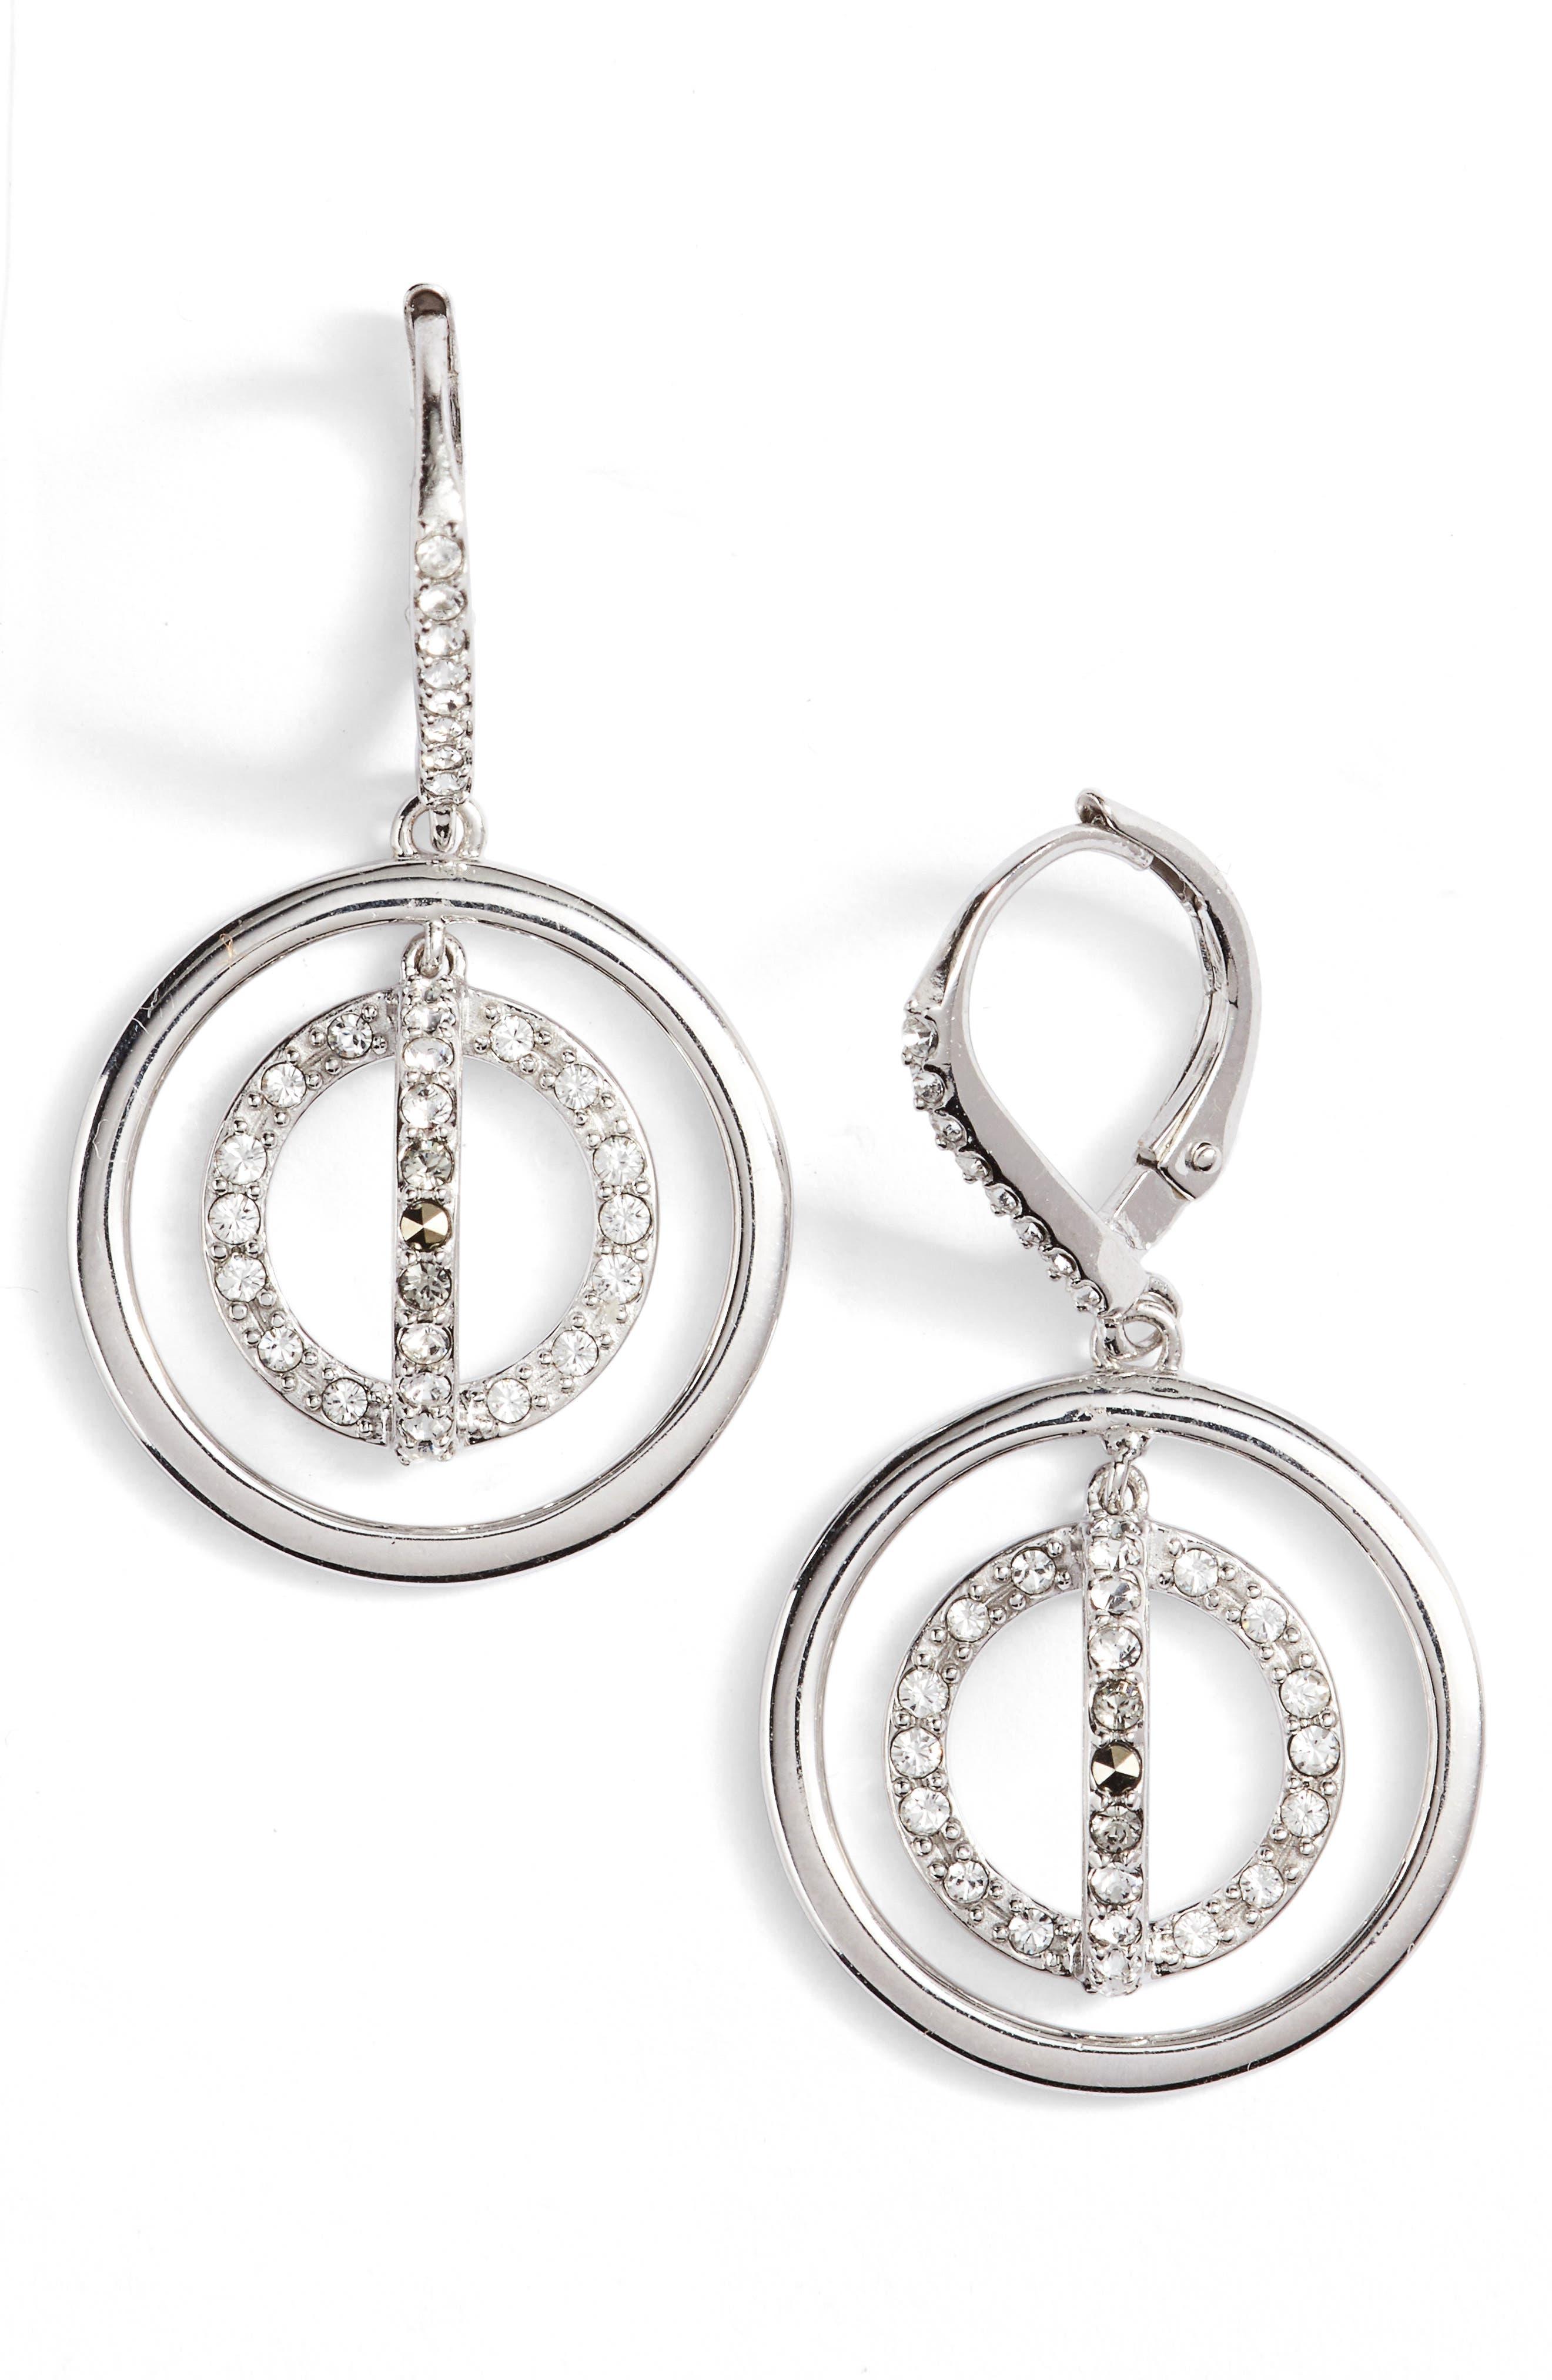 JUDITH JACK Sparkle Silver Crystal Drop Earrings